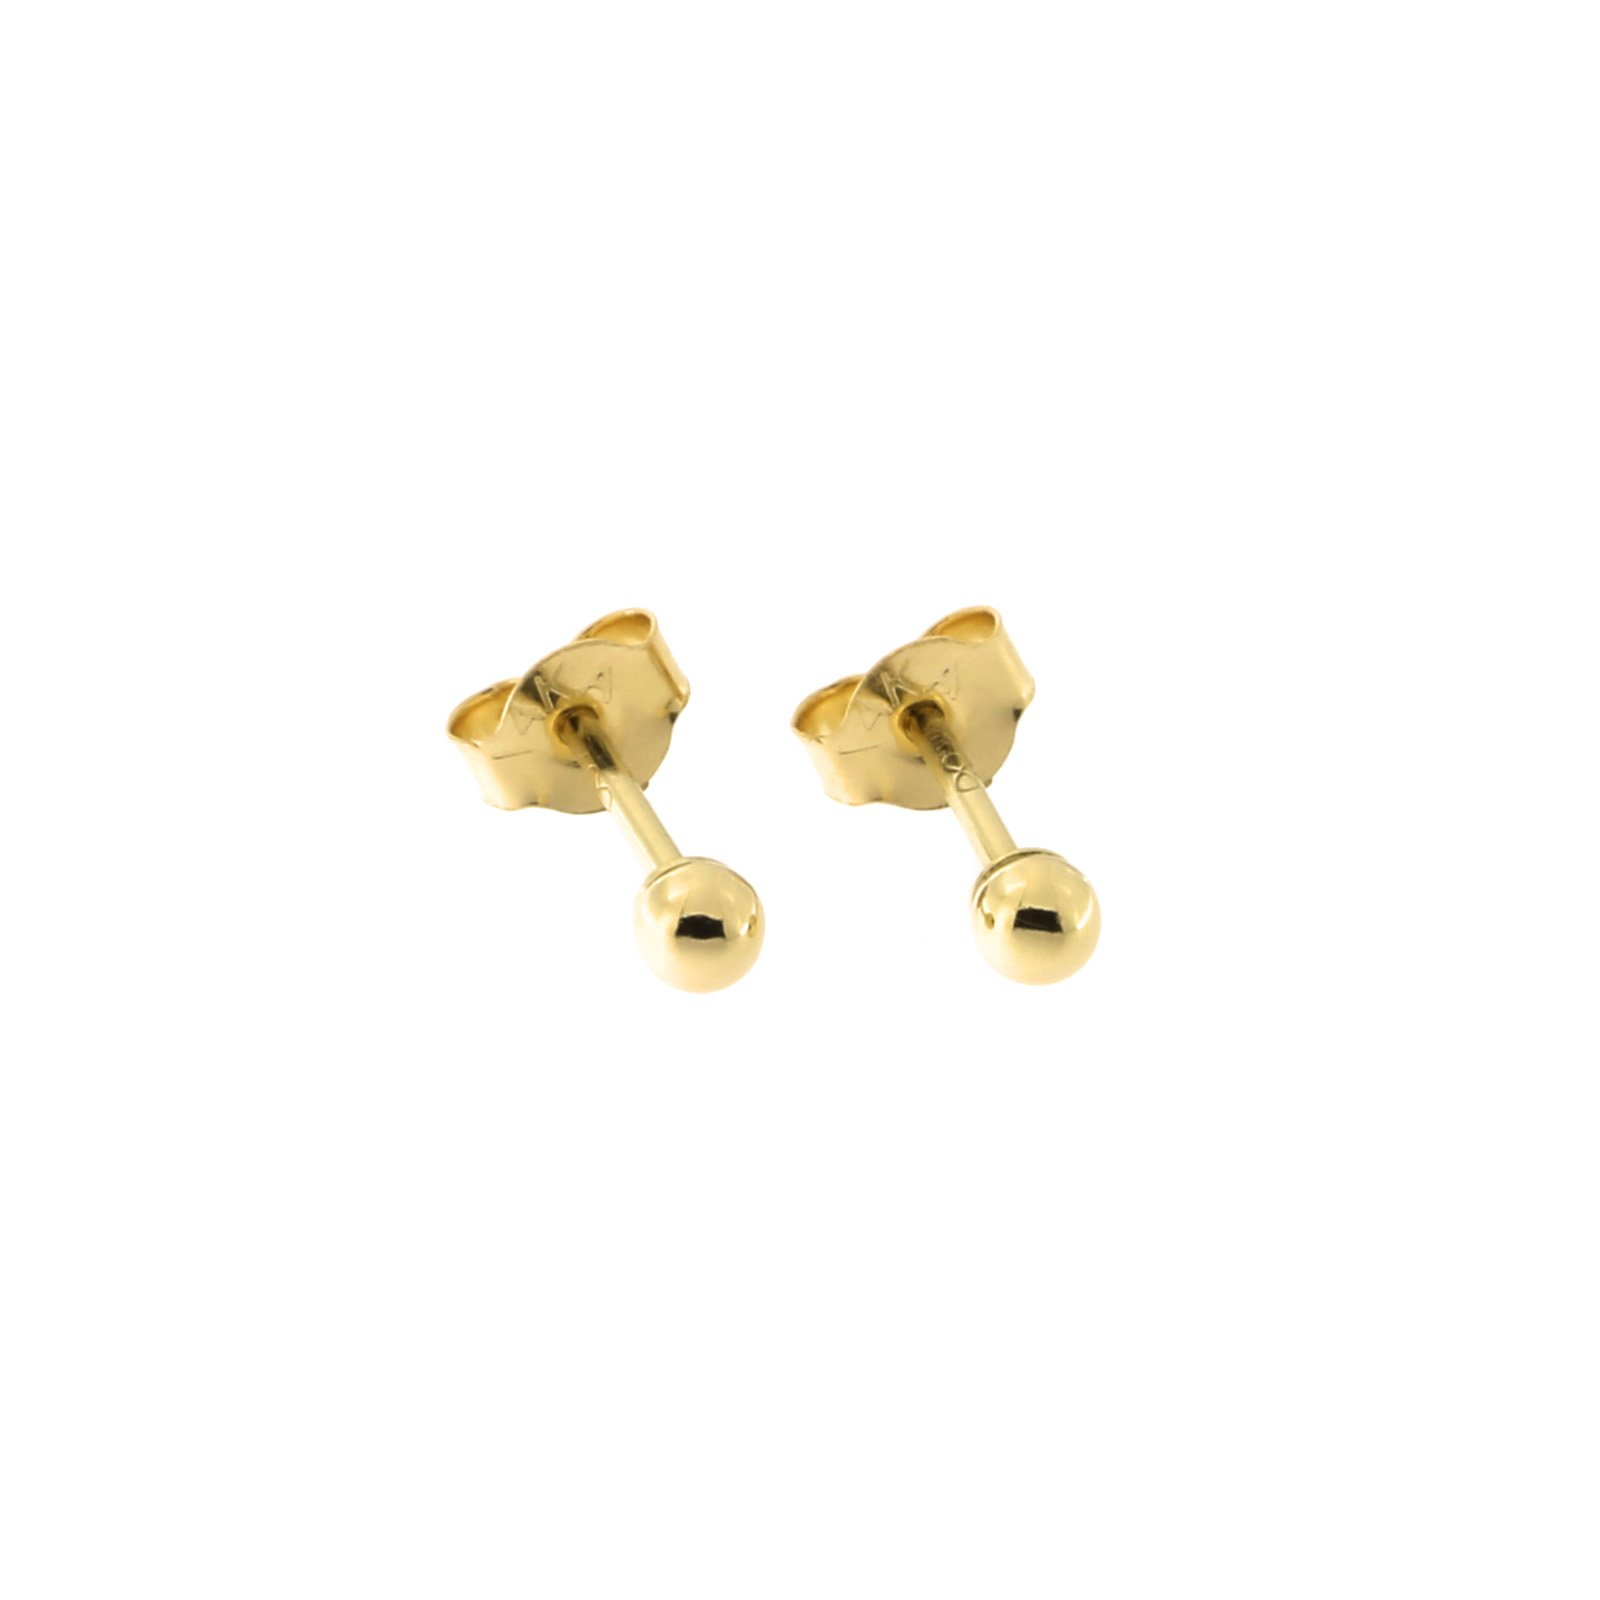 14 Karat Yellow Gold Round Bead Ball Stud Earrings, 2mm